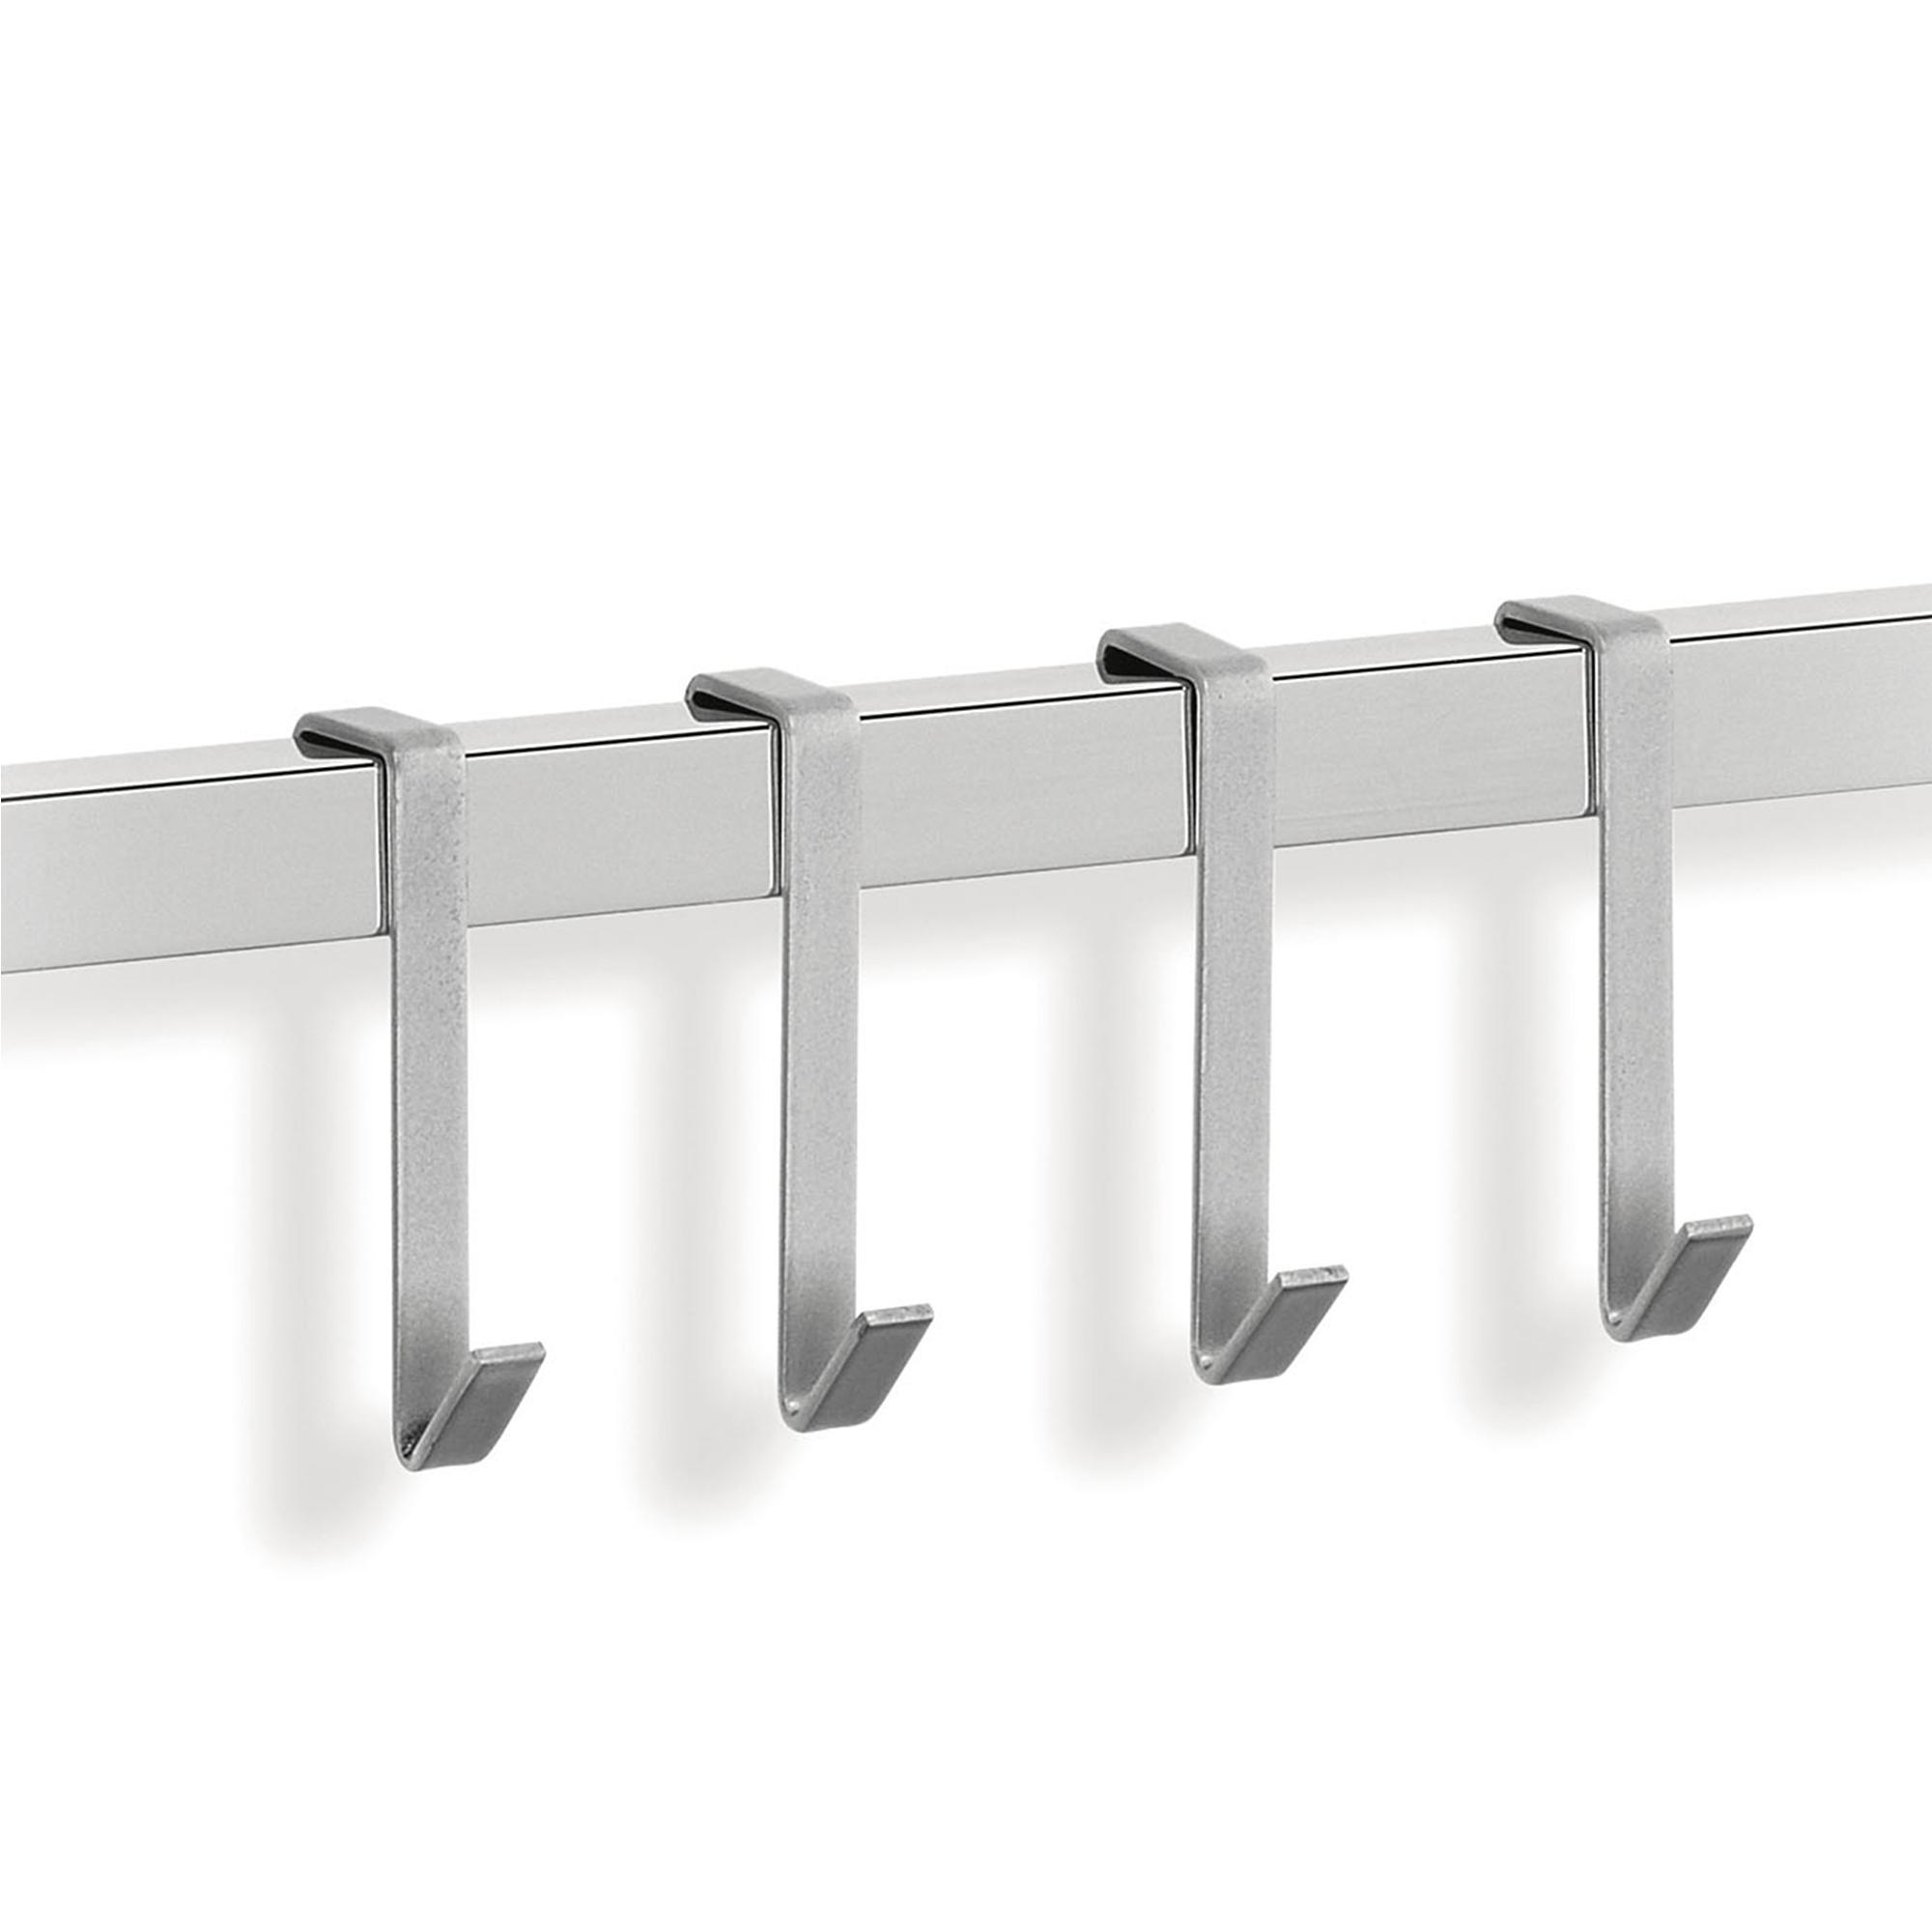 Ganci set 4pz linea quadro applicabili alla barra - Barra portautensili cucina ...